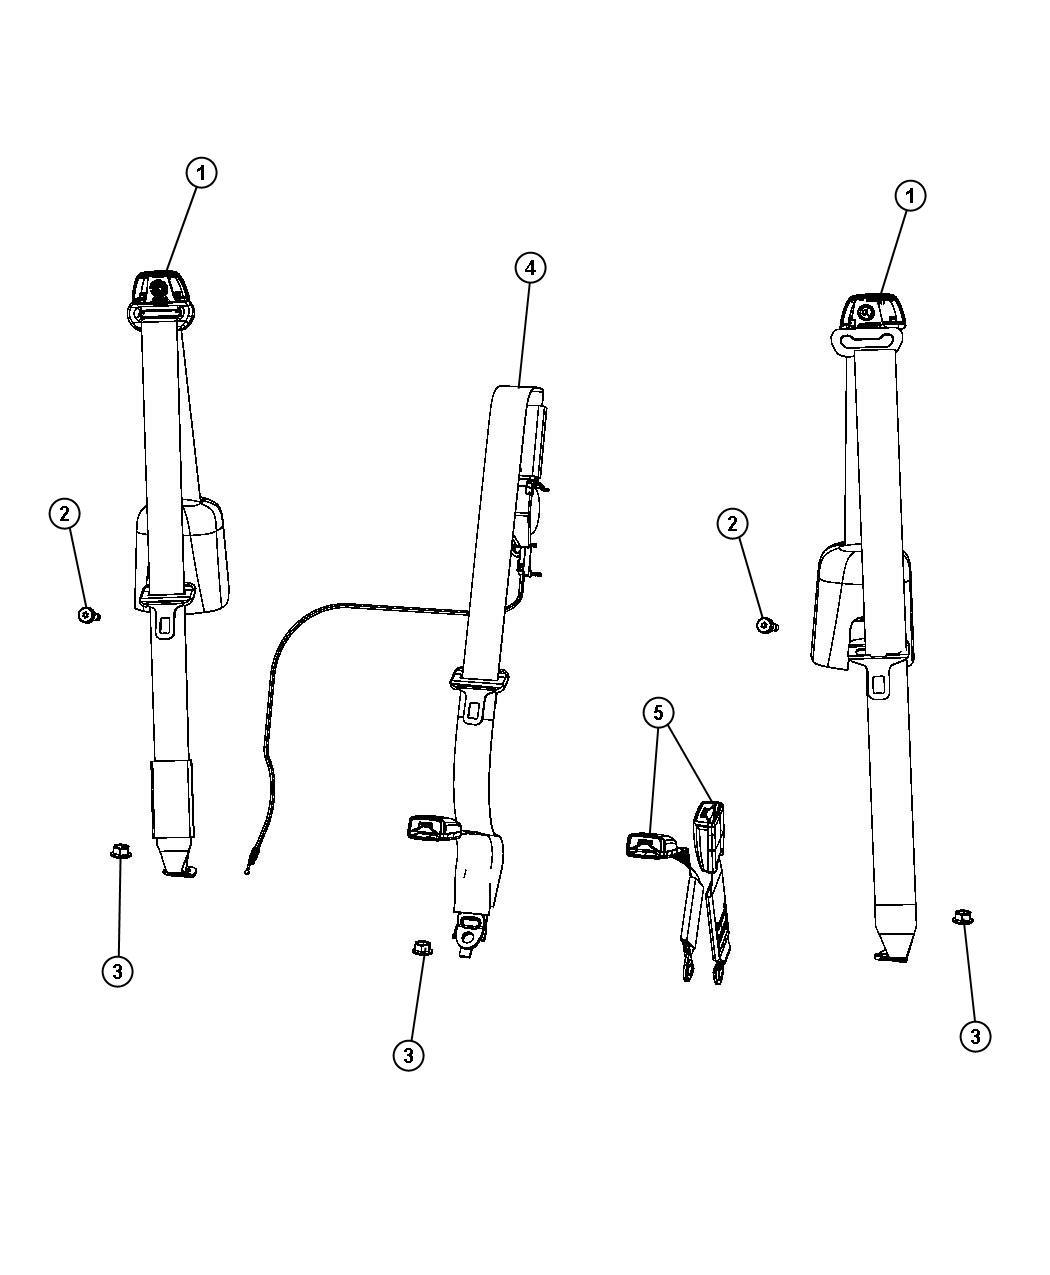 2001nissansentrapartsdiagram 2001 Nissan Sentra Parts Diagram Http